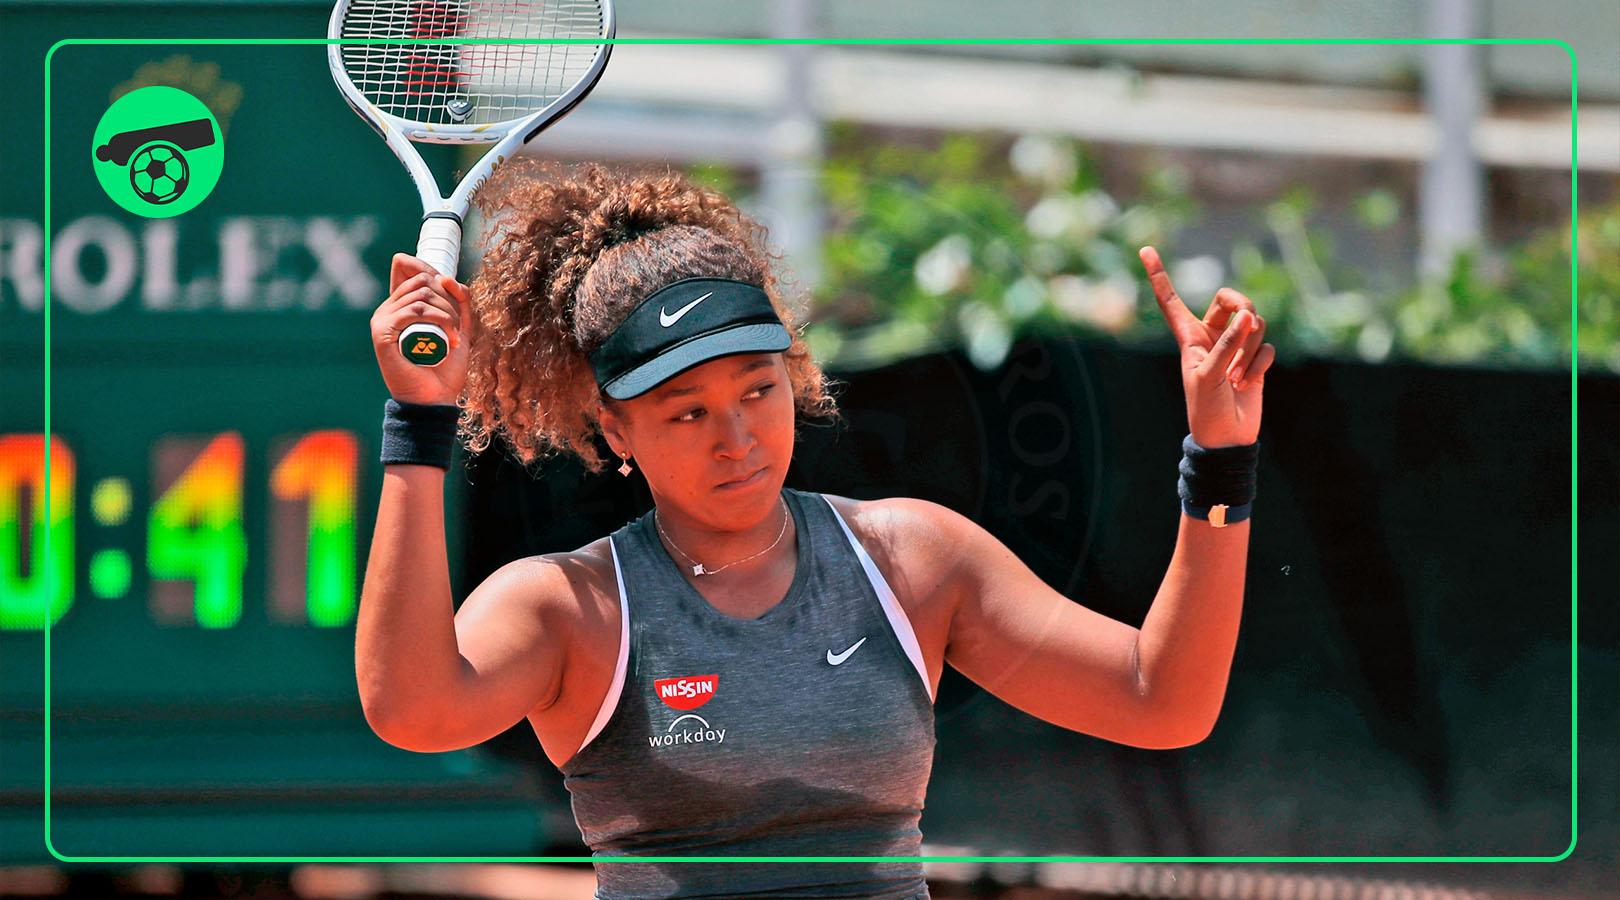 Naomi Osaka will face expulsion from the French Open and future Grand Slams